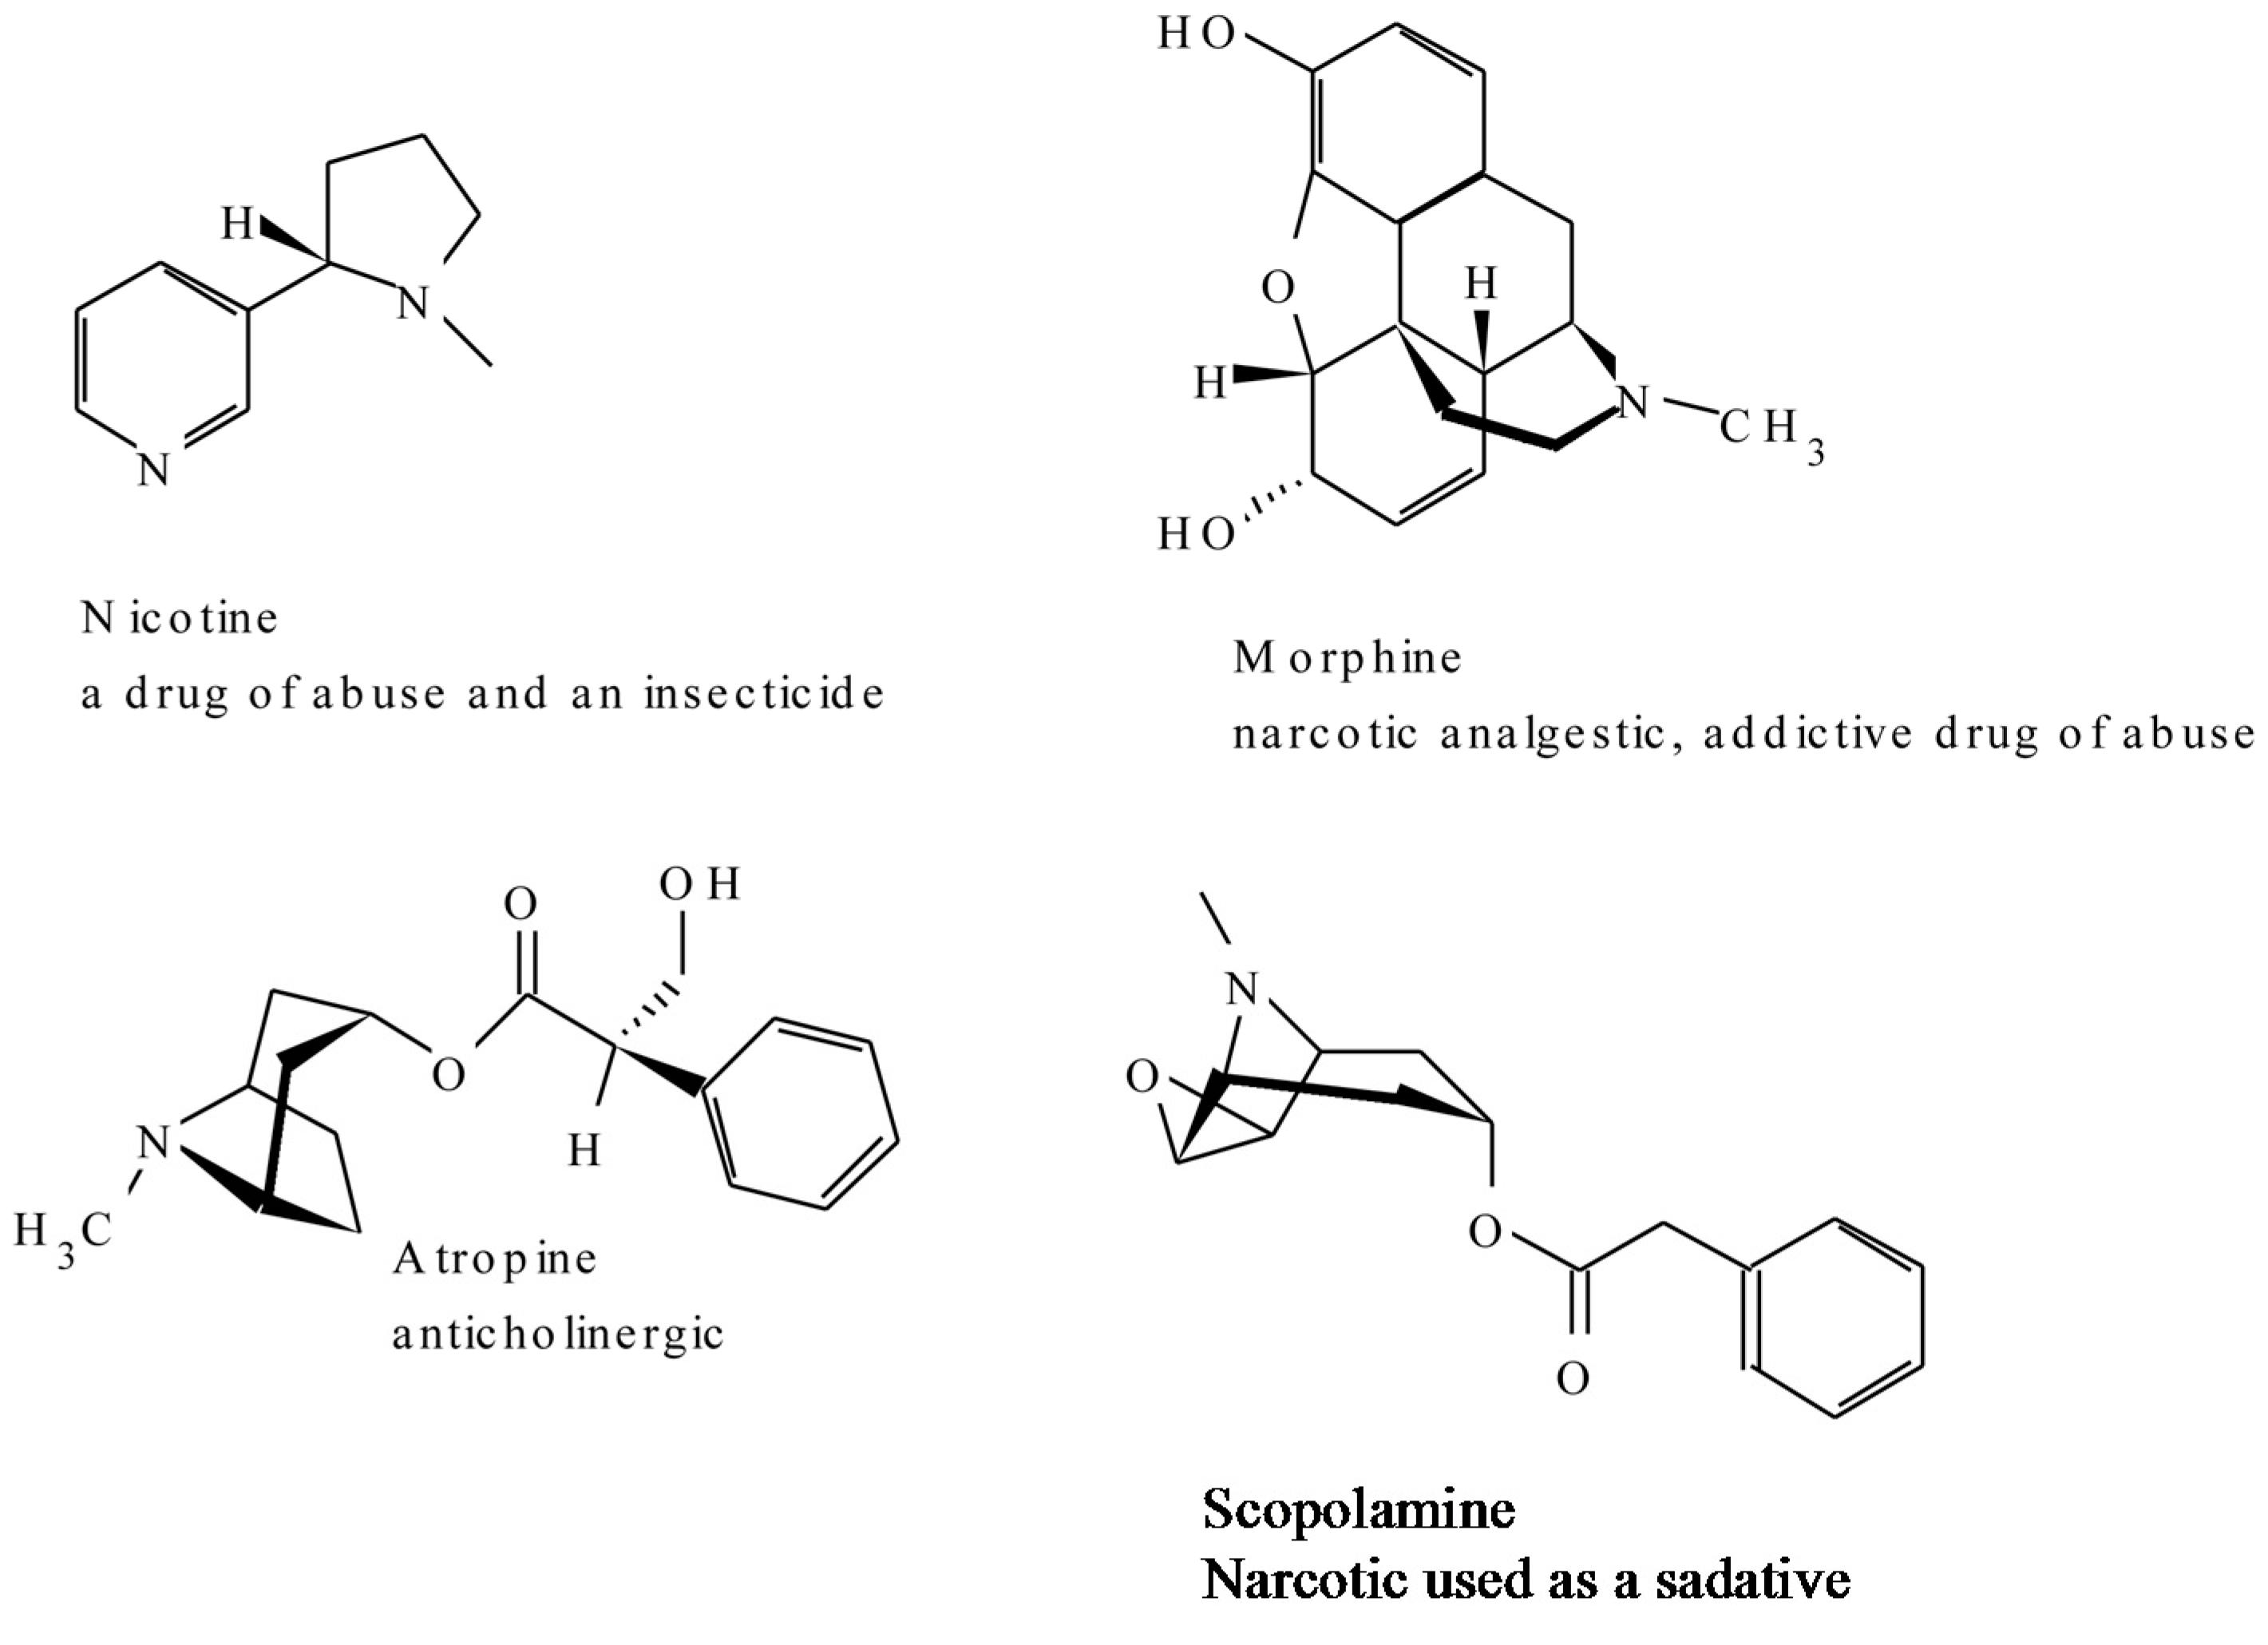 vergiften mit co2 holzkohle